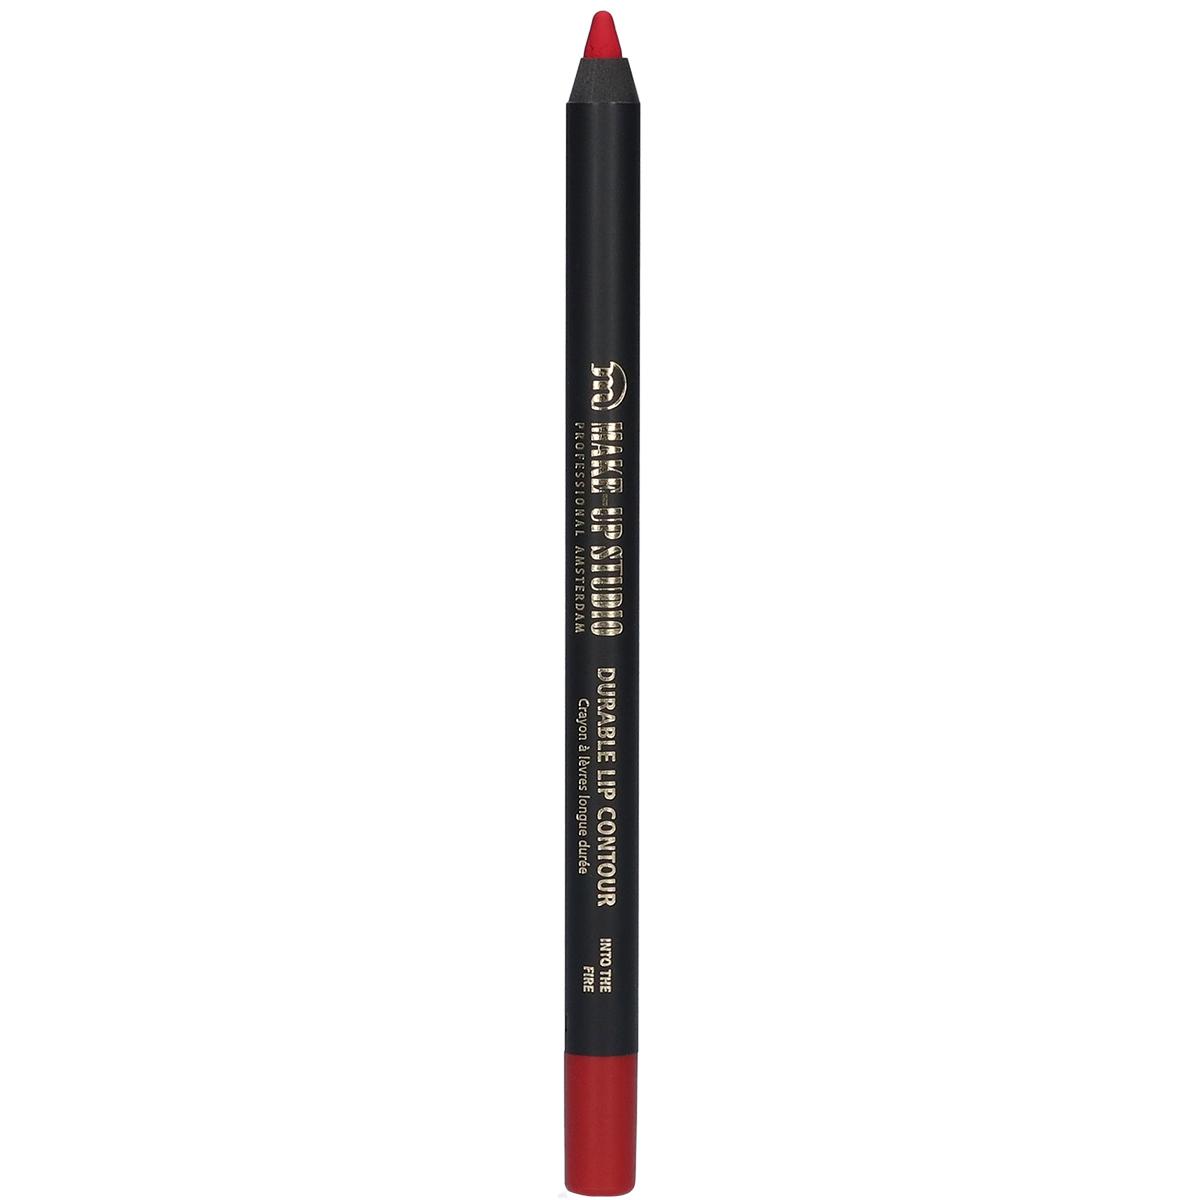 Durable Lip Contour Lippotlood - Into the Fire